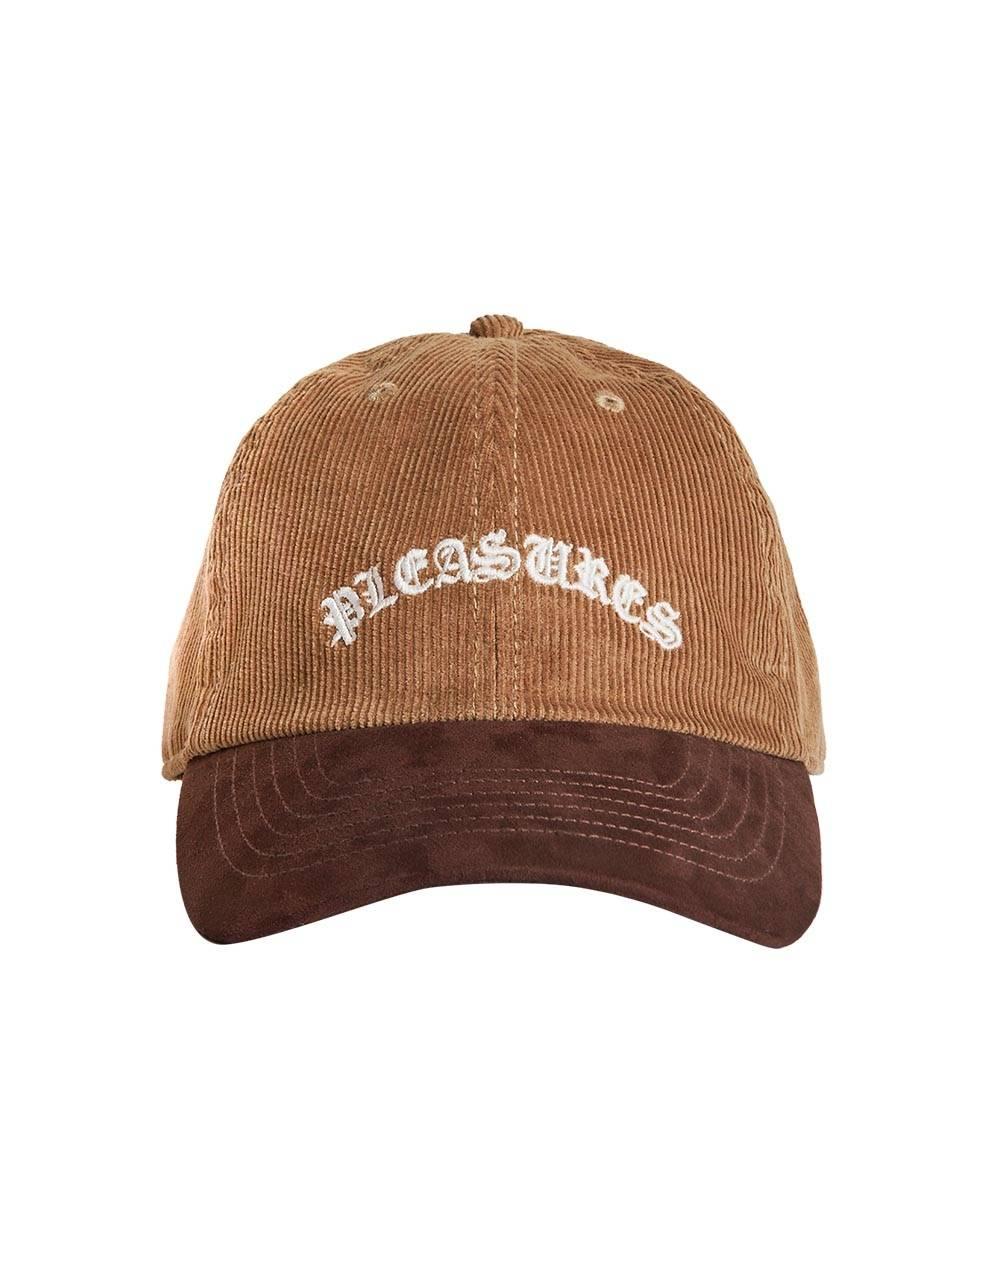 Pleasures Old & corduroy polo cap - brown Pleasures Hat 50,00€